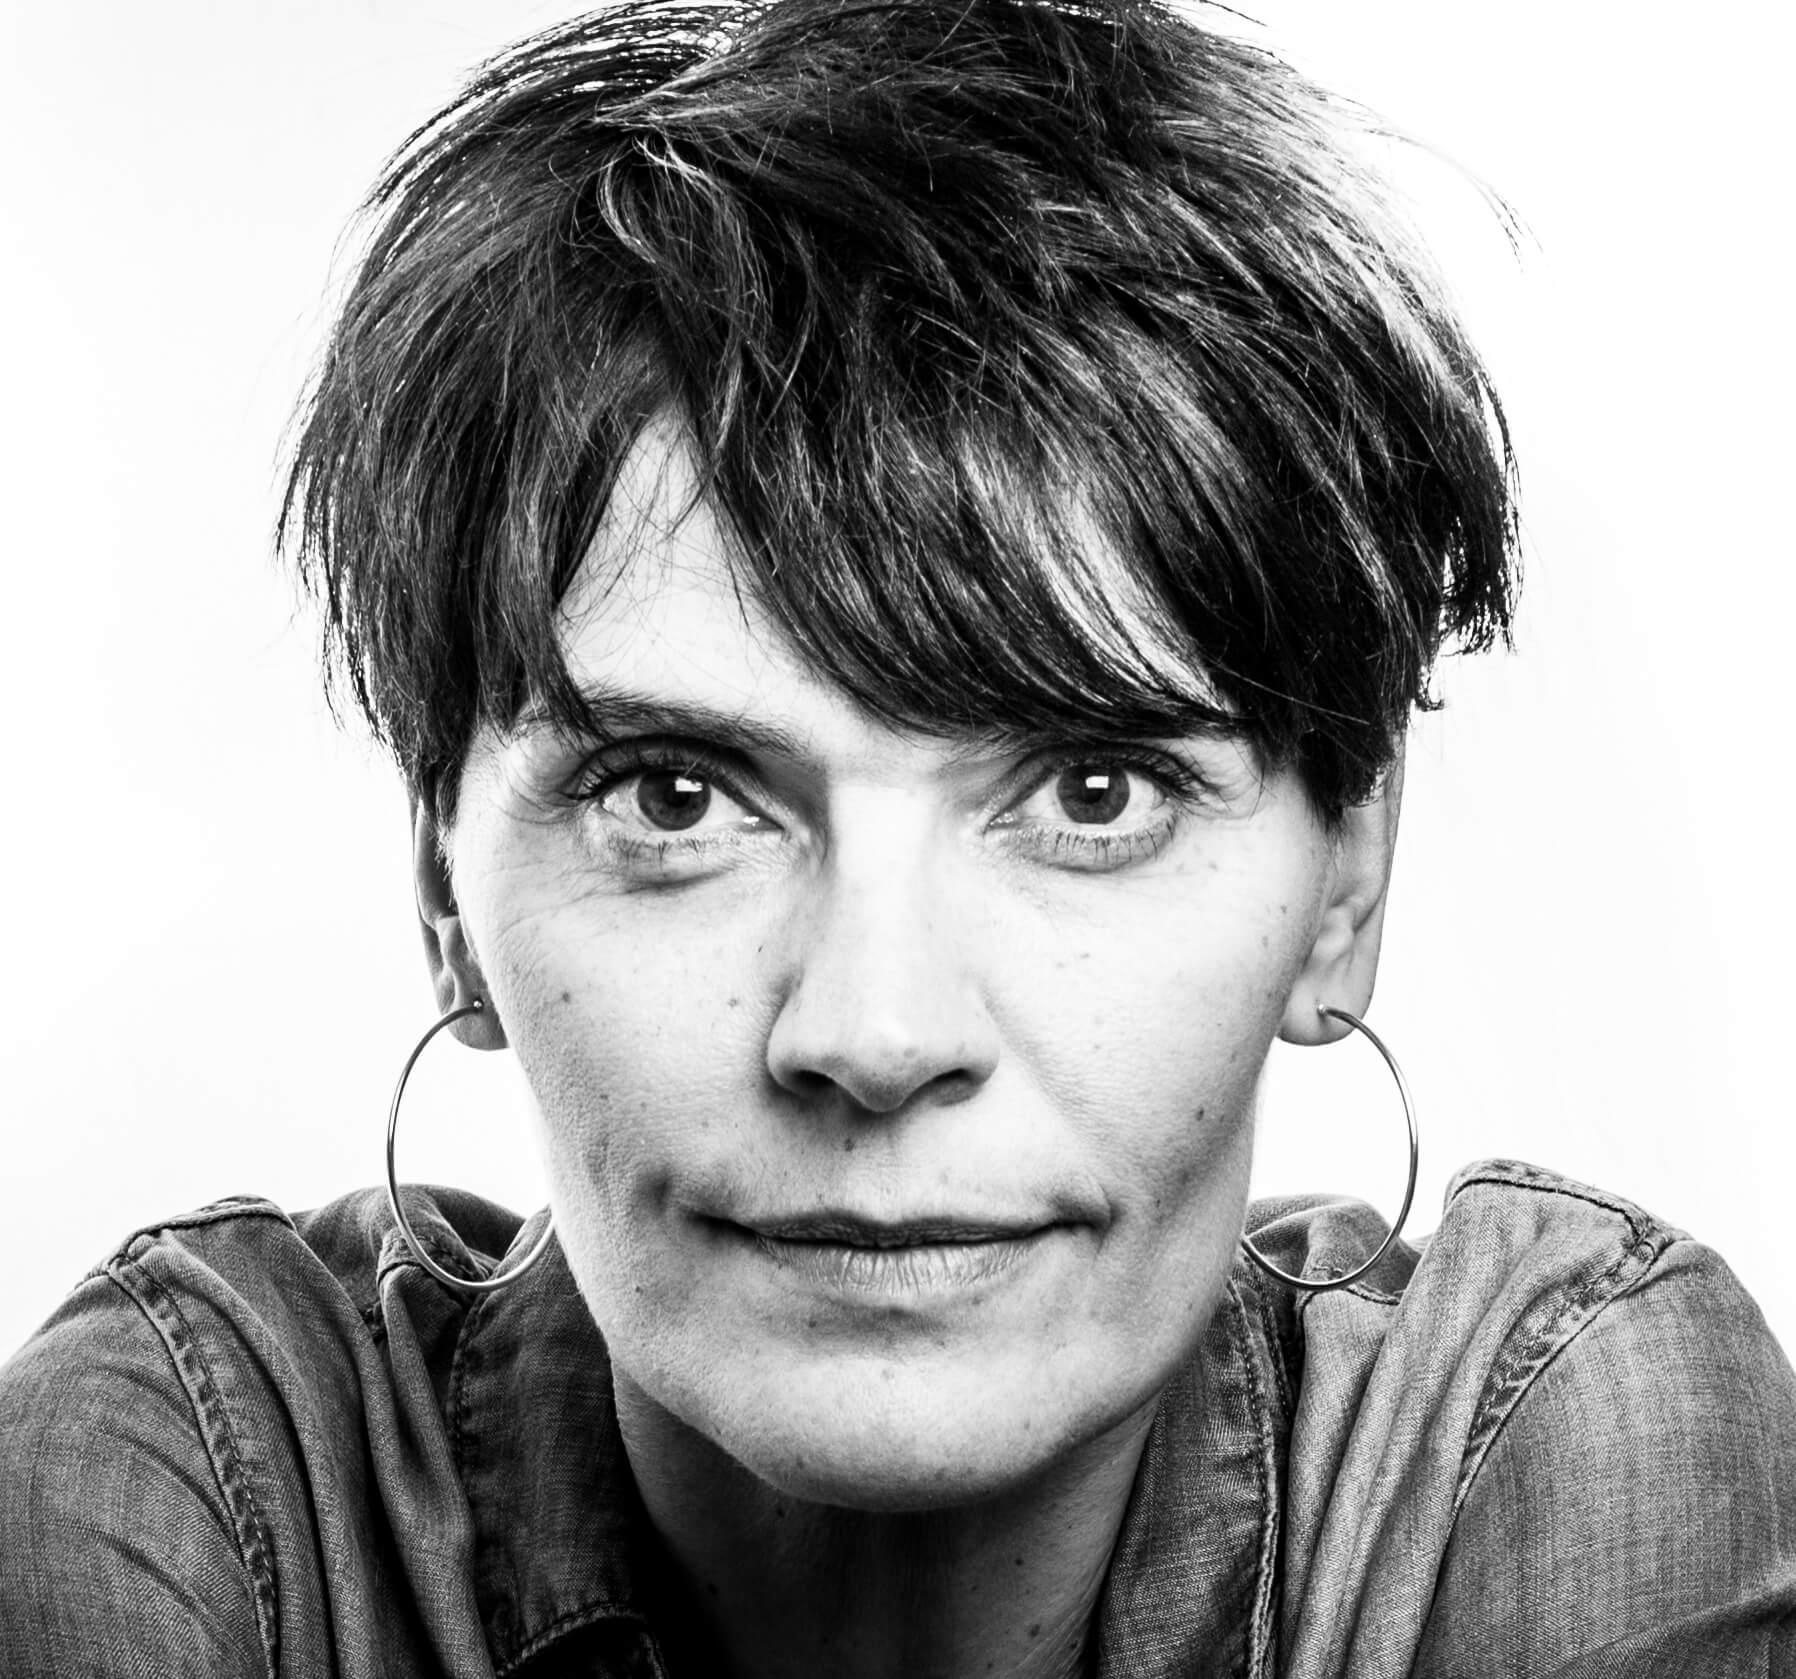 Alexandra Zetterberg-Ehn